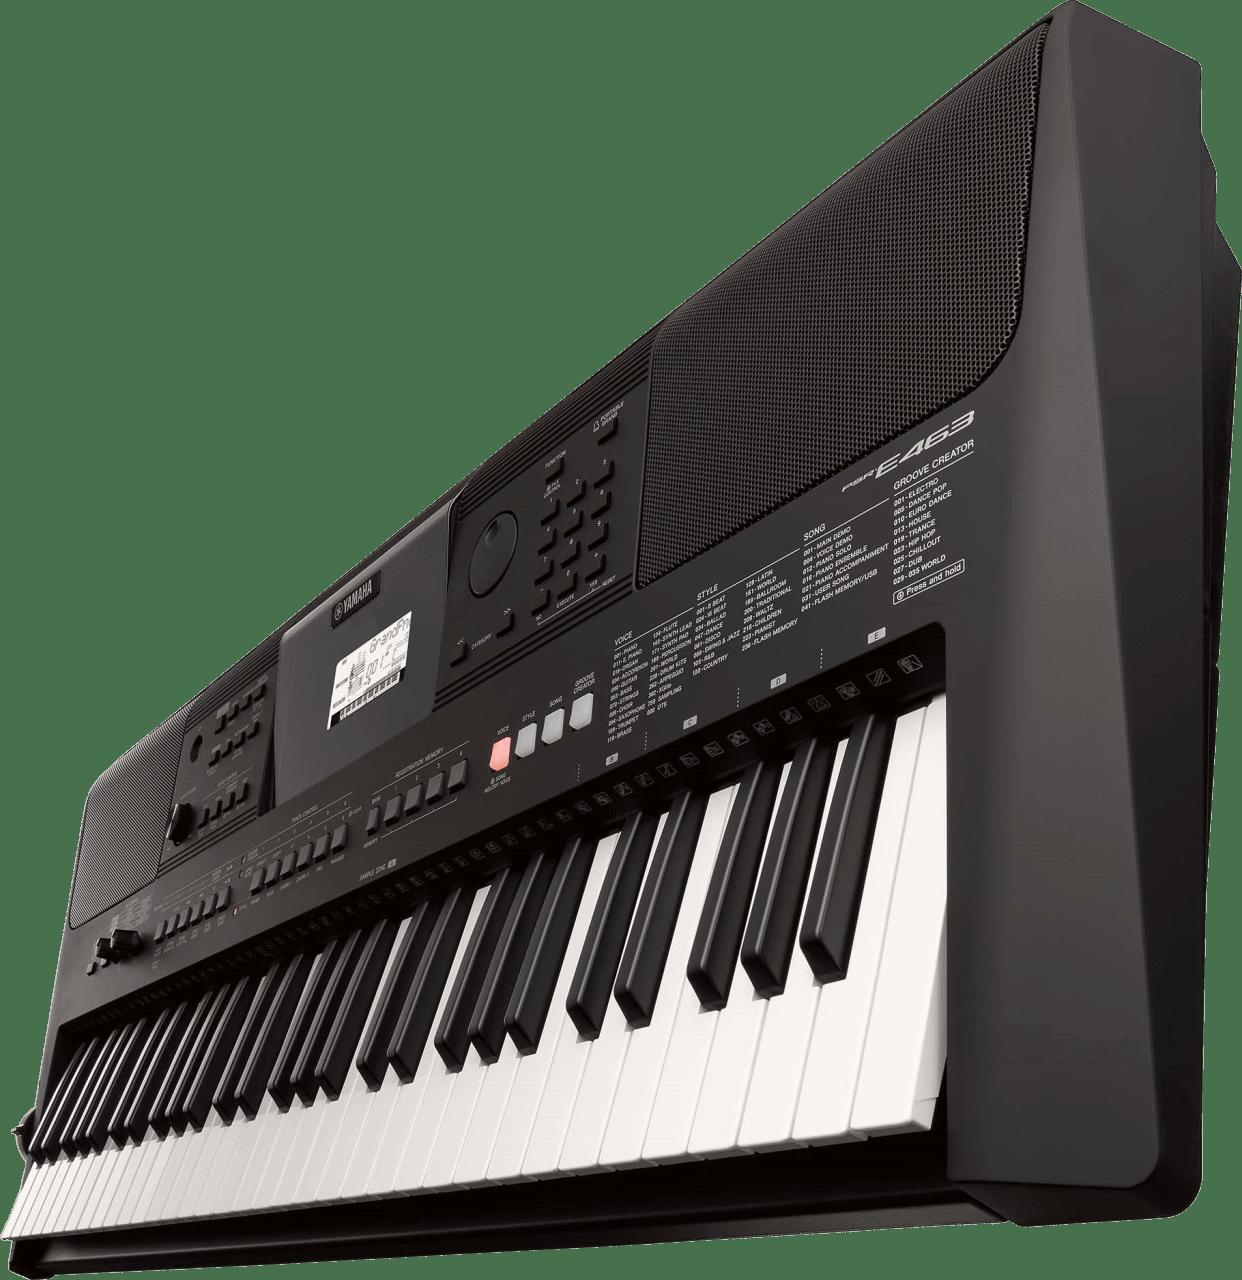 Schwarz Yamaha PSR-E463 Tragbares Keyboard mit 61 Tasten.4